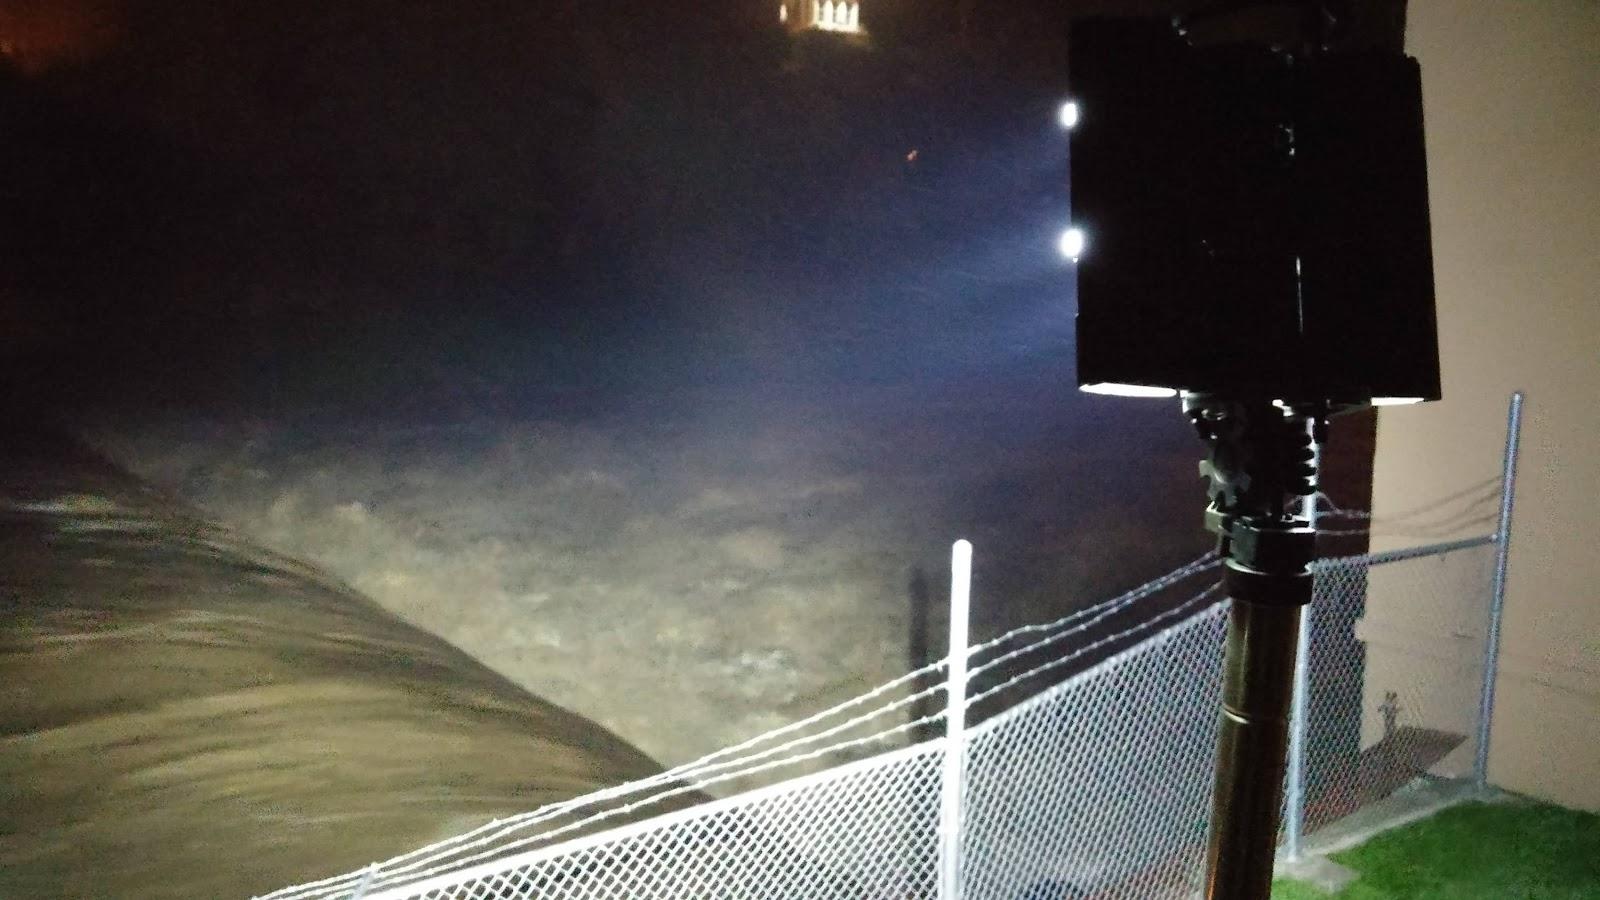 FoxFury Nomad 360 Scene Light Over Looks Turkey River for Flooding